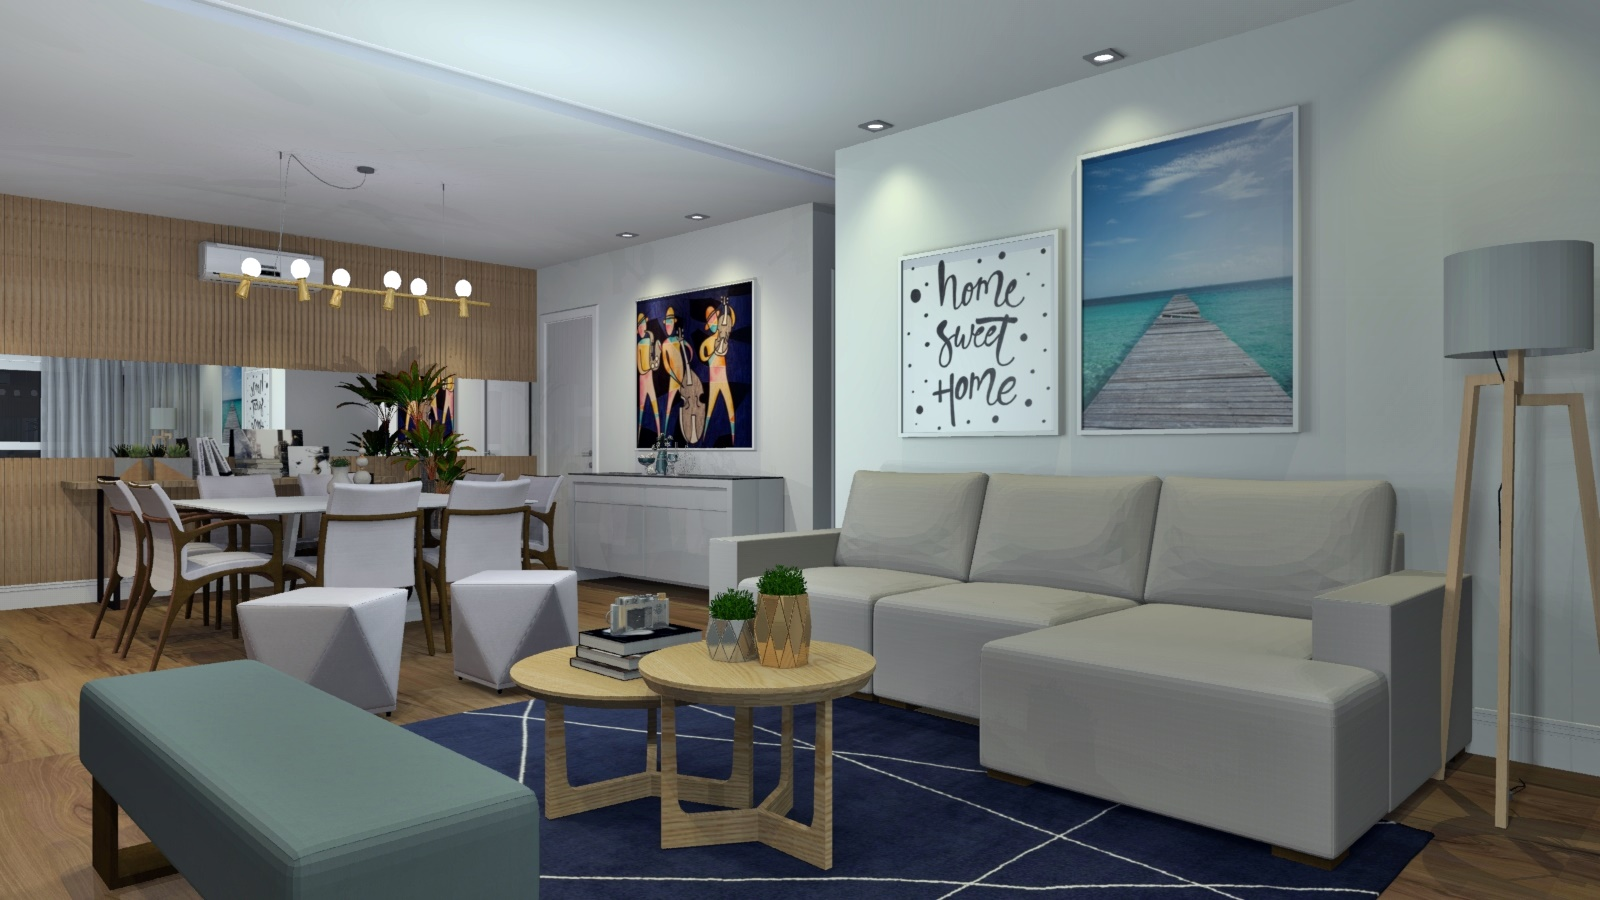 Sala de estar estilo Moderno sofisticado Rústico